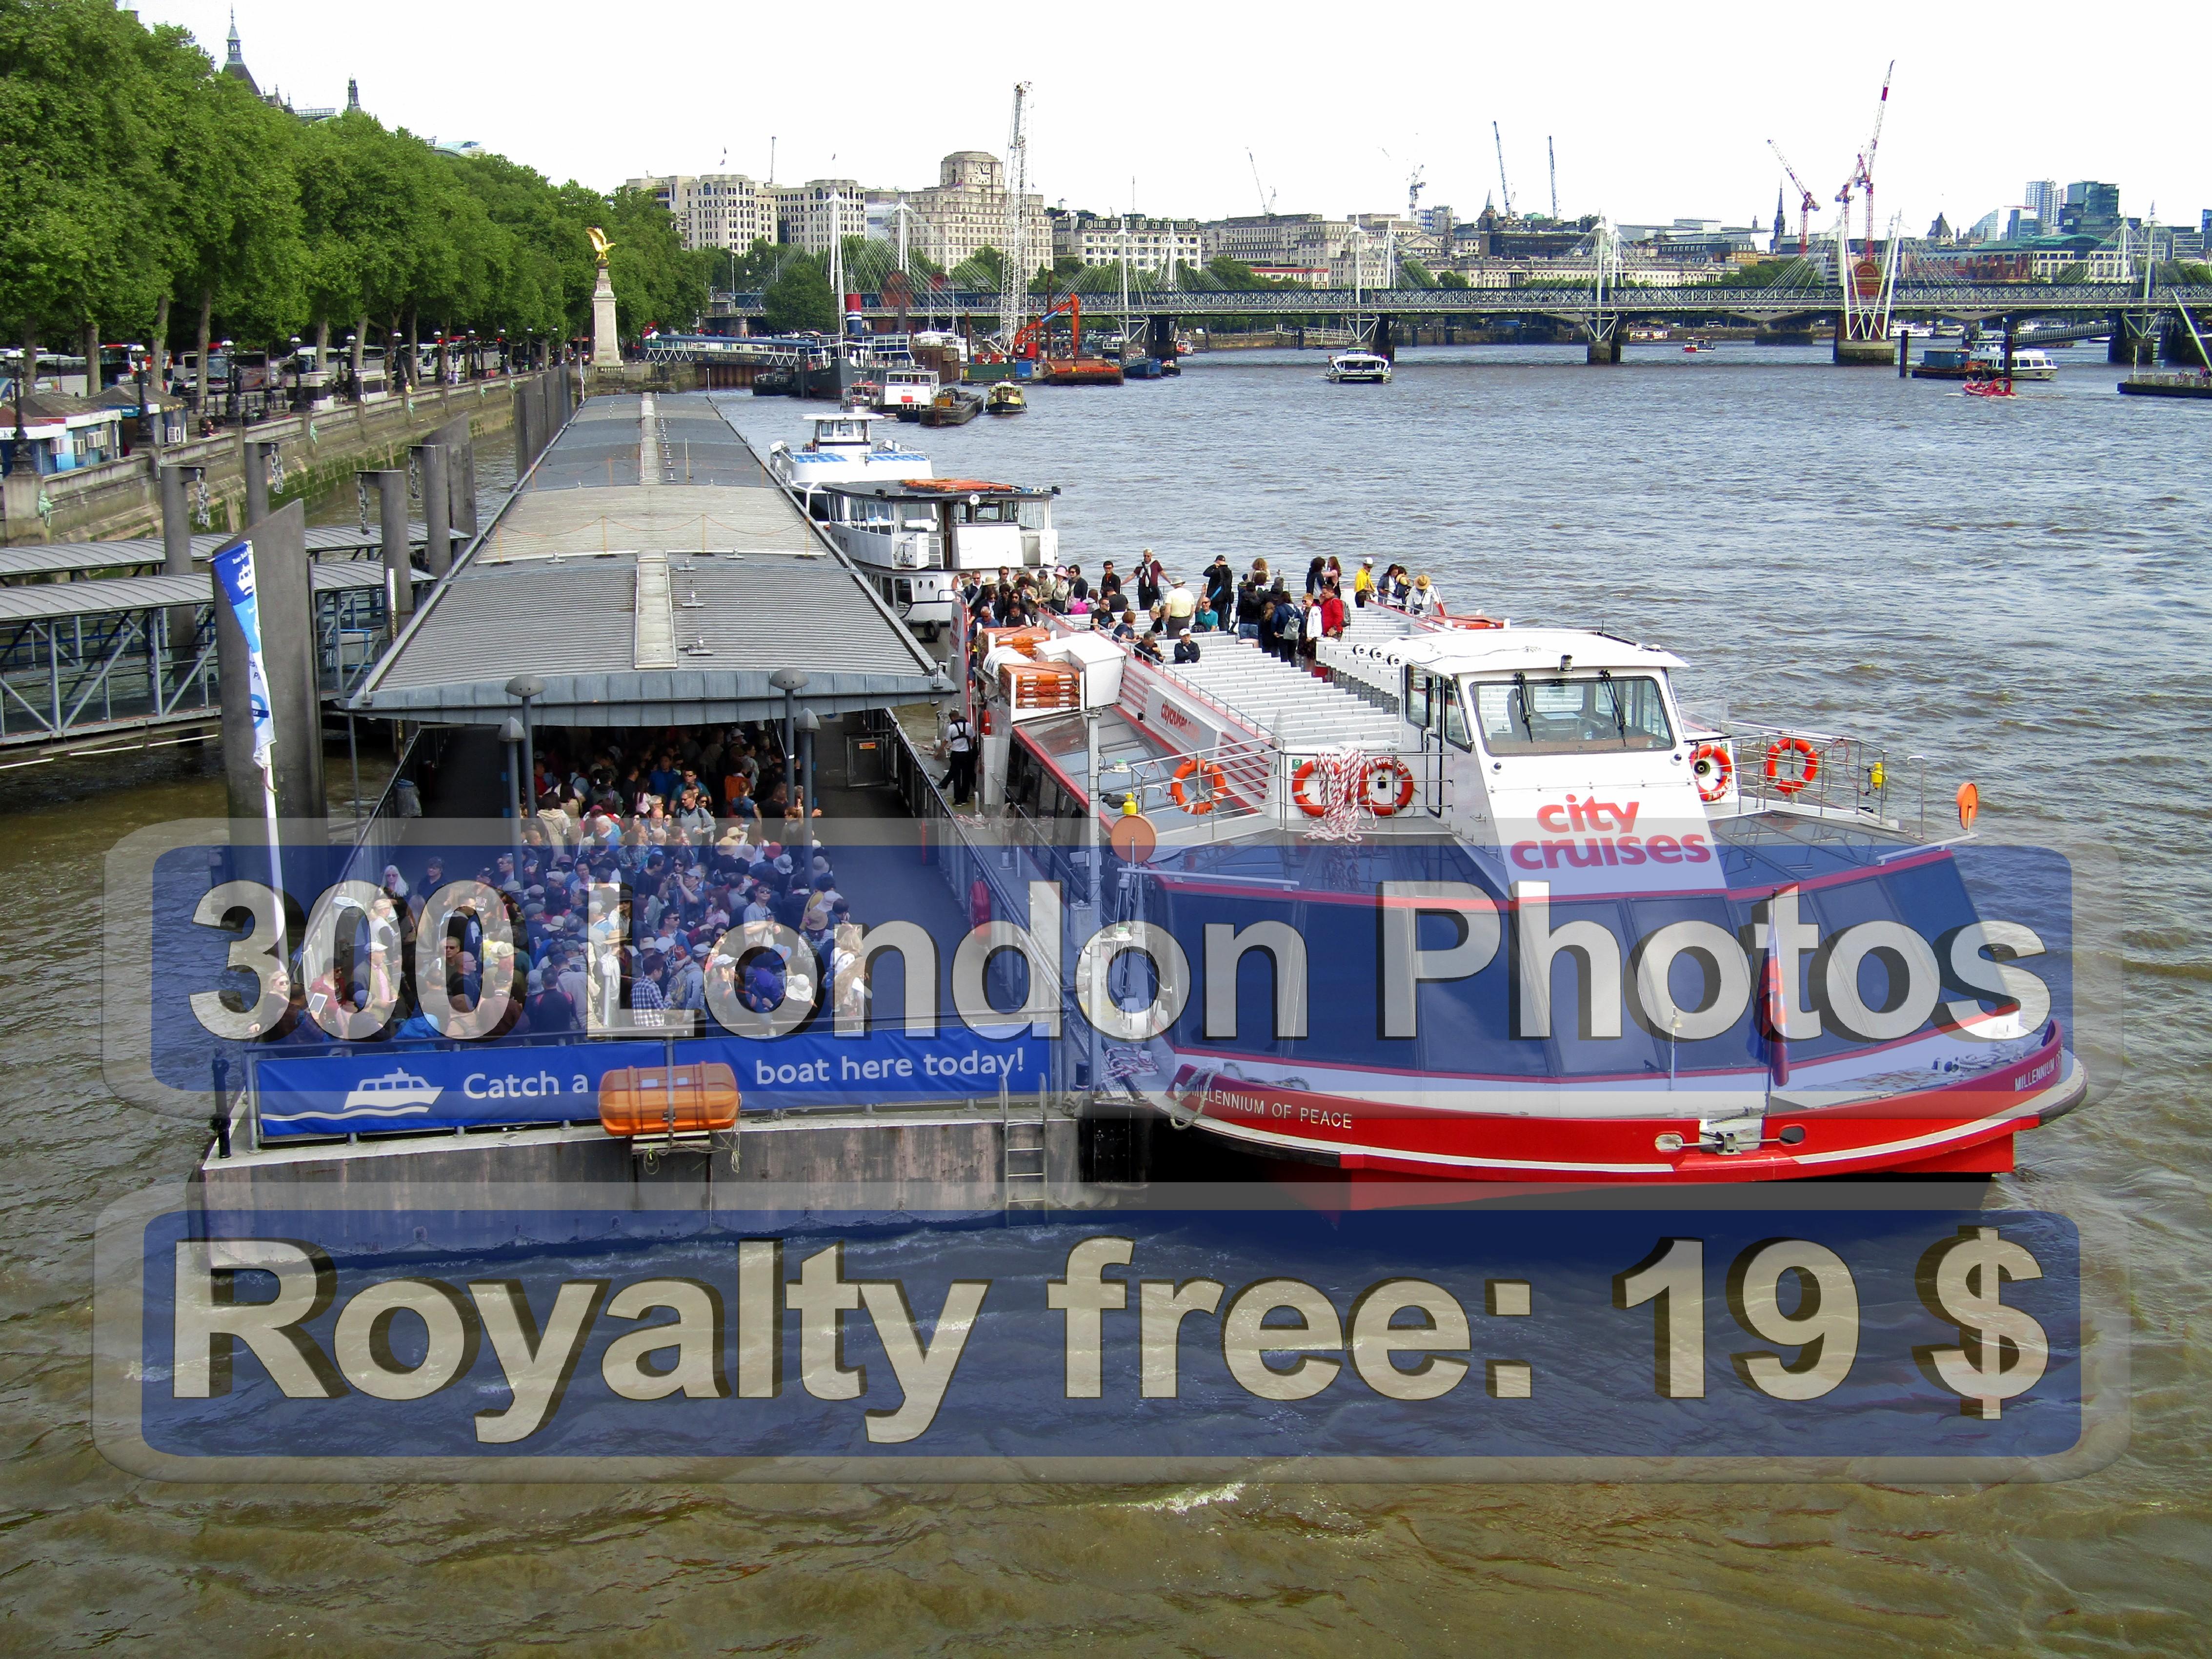 London Drugs Photo Promo Code